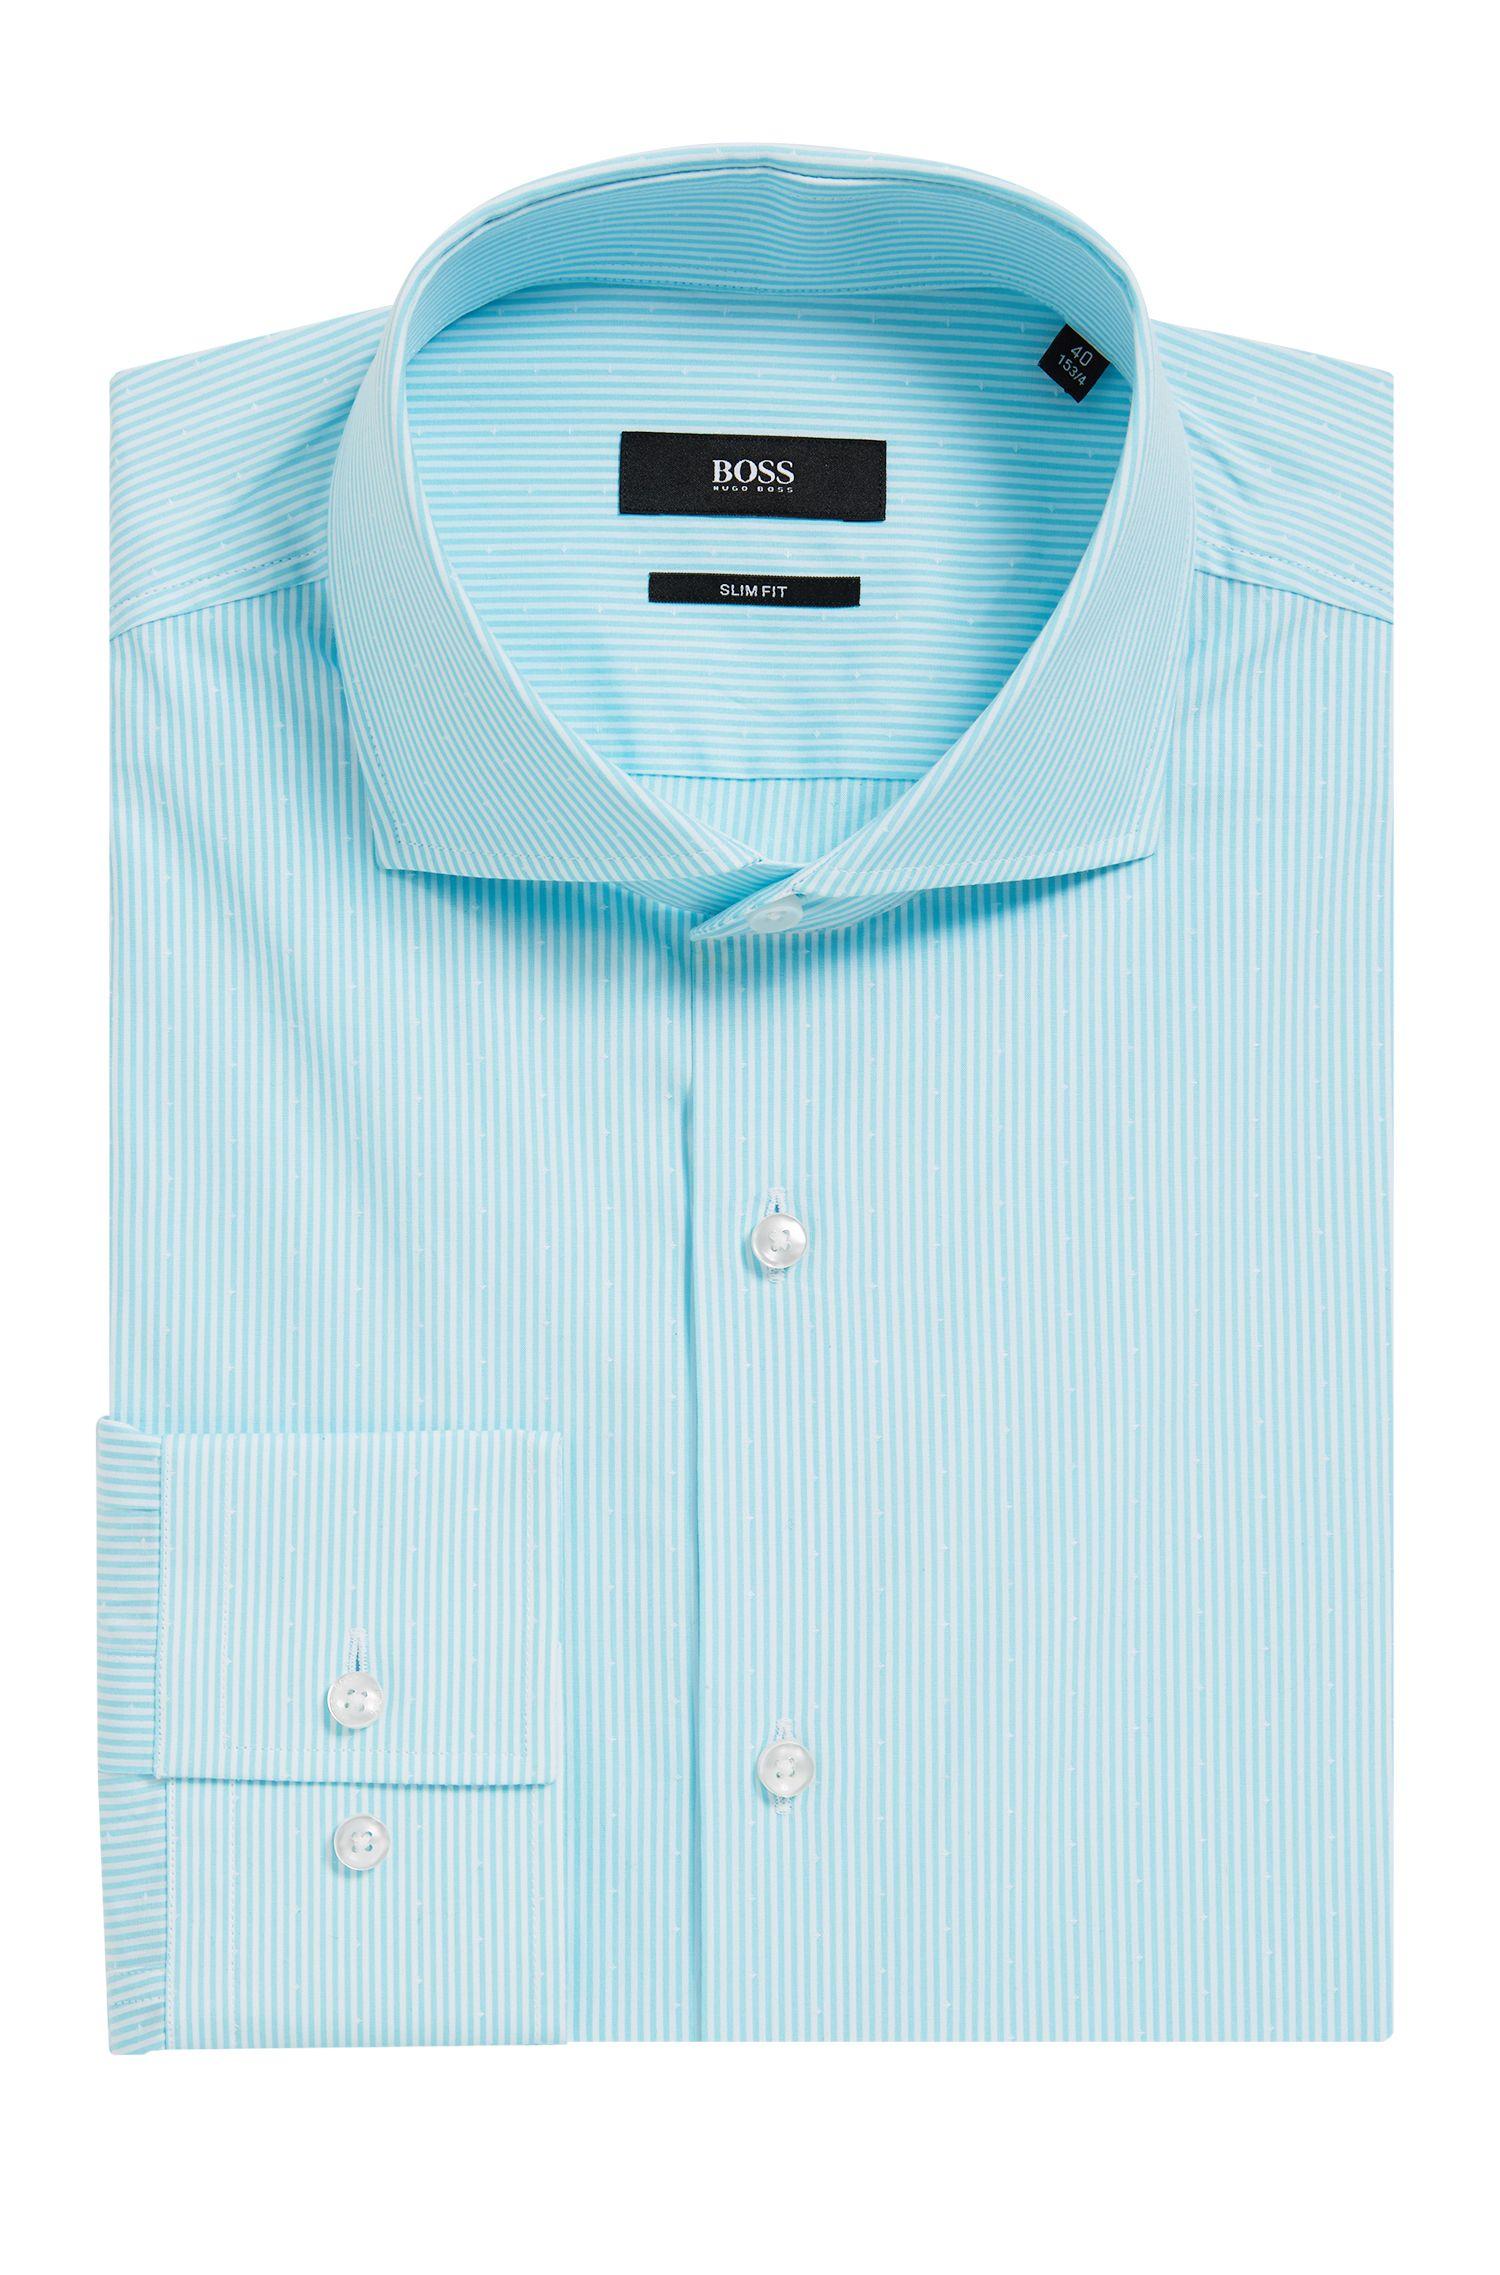 Striped Cotton Dress Shirt, Slim Fit | Jason, Turquoise